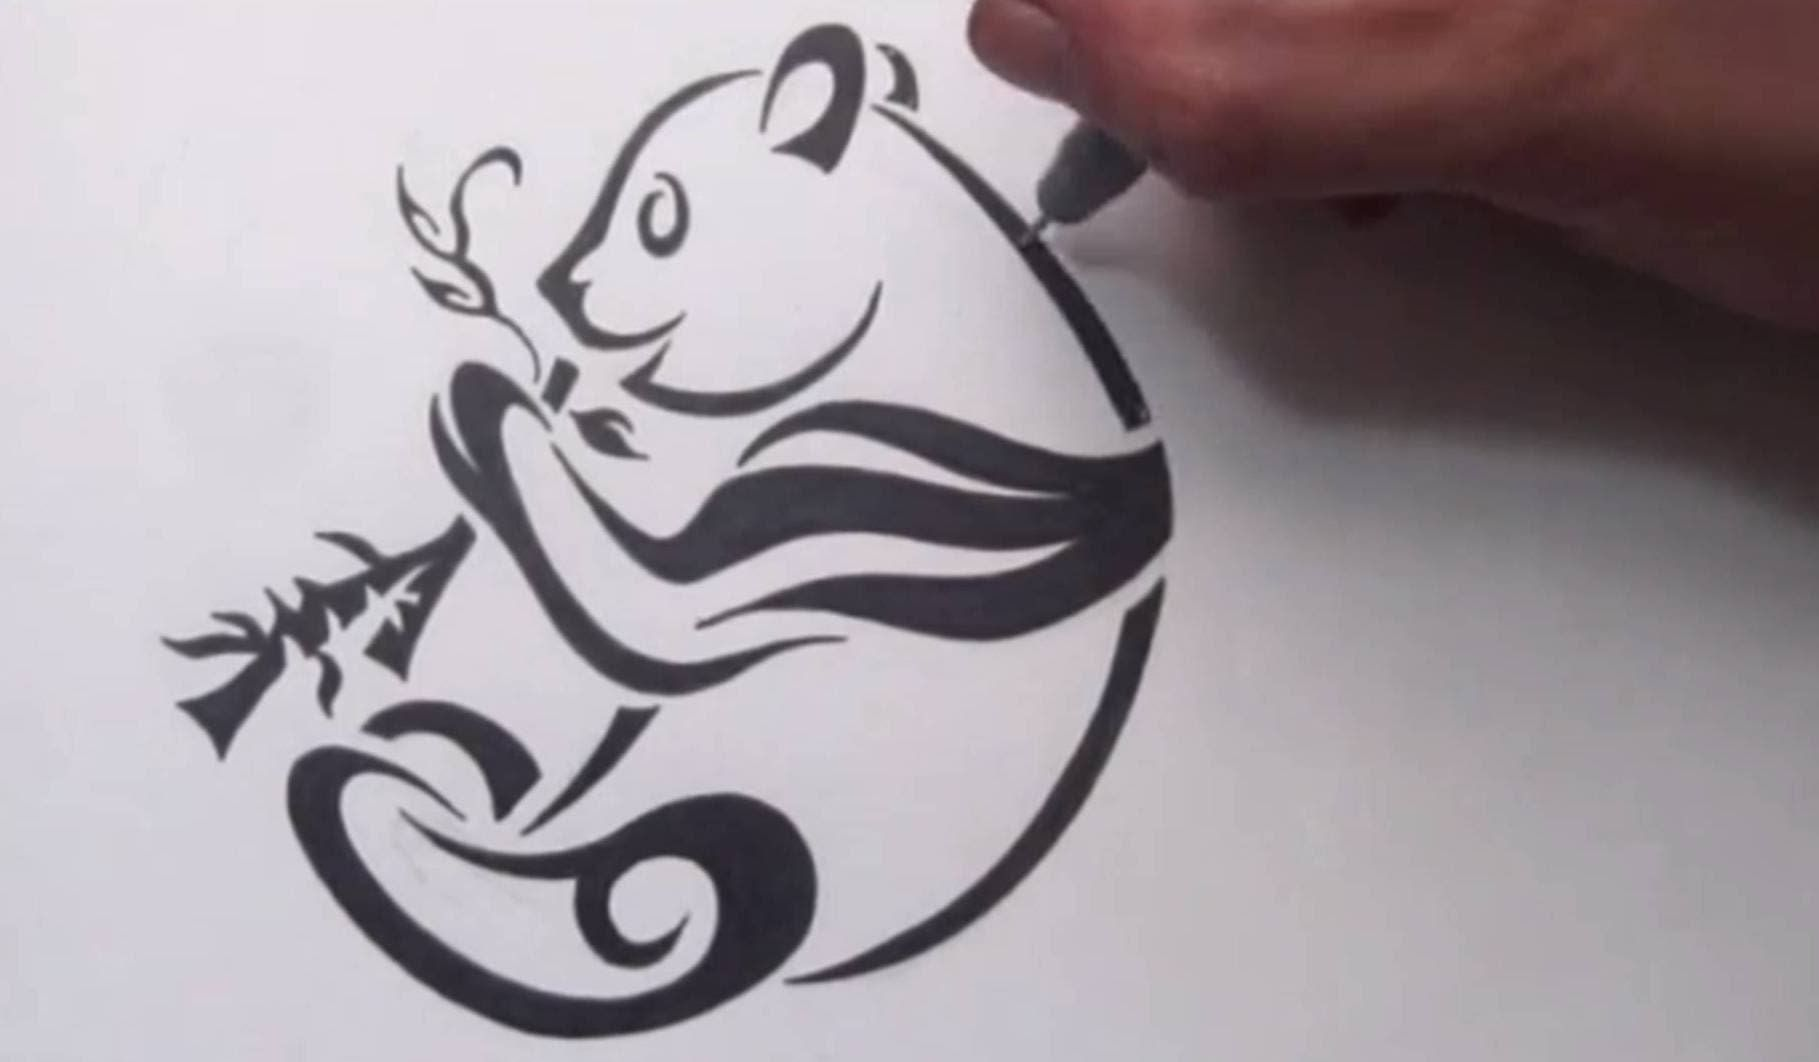 Drawing A Simple Tribal Tattoo Design